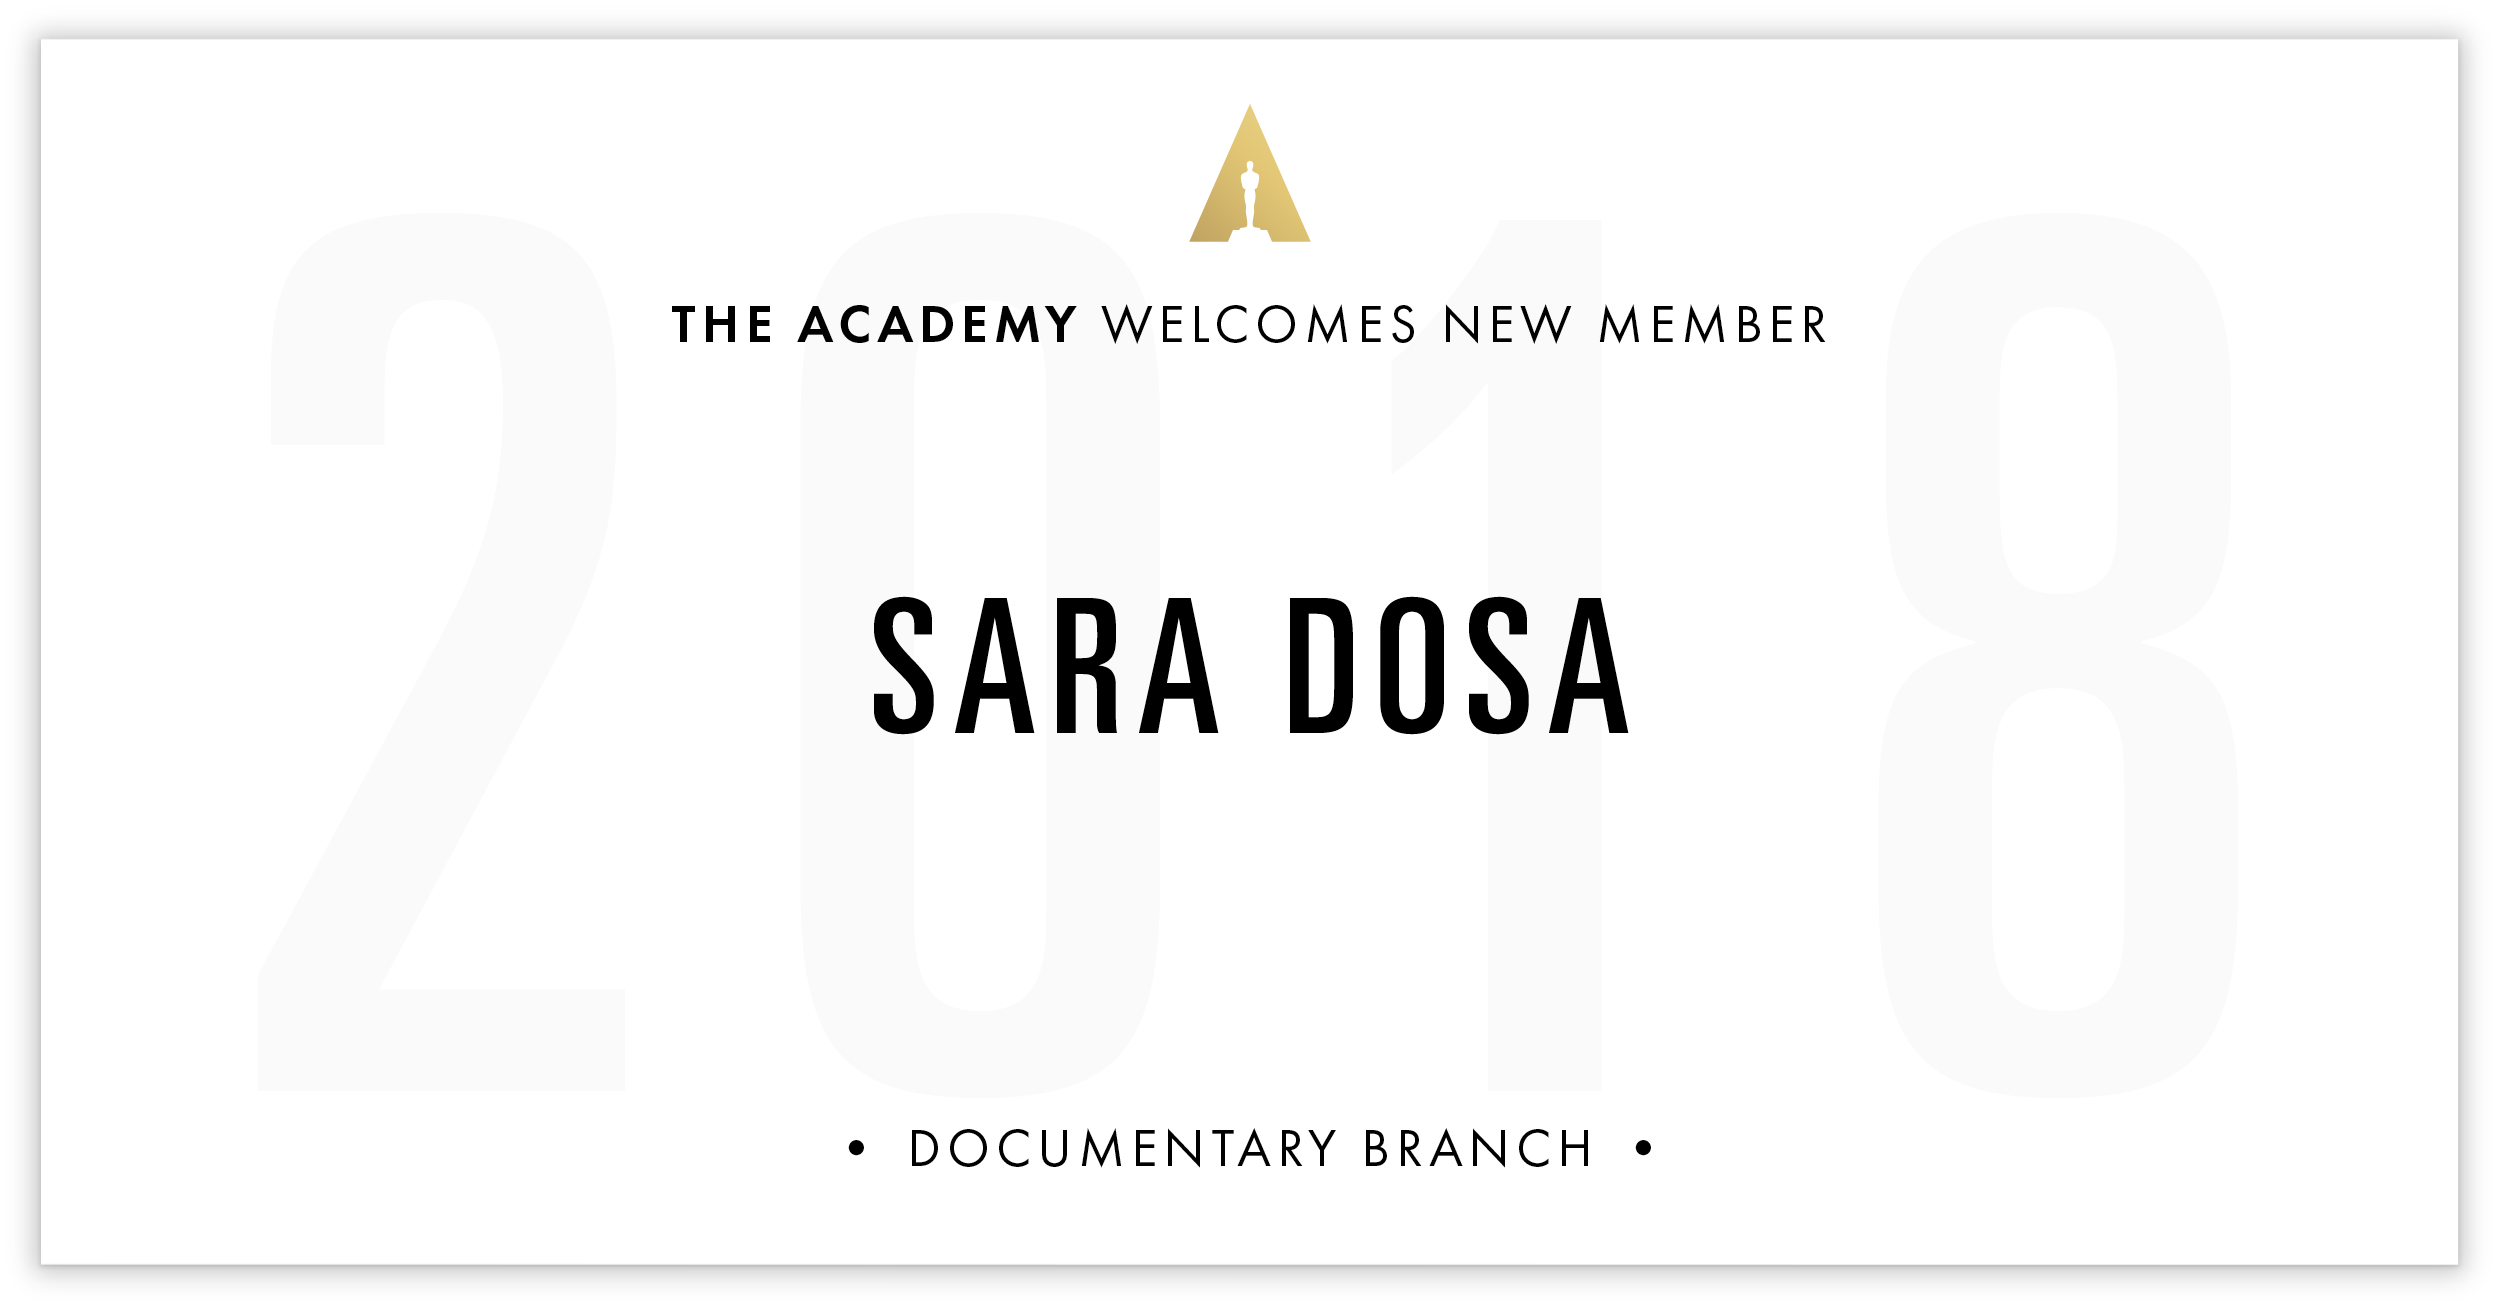 Sara Dosa is invited!